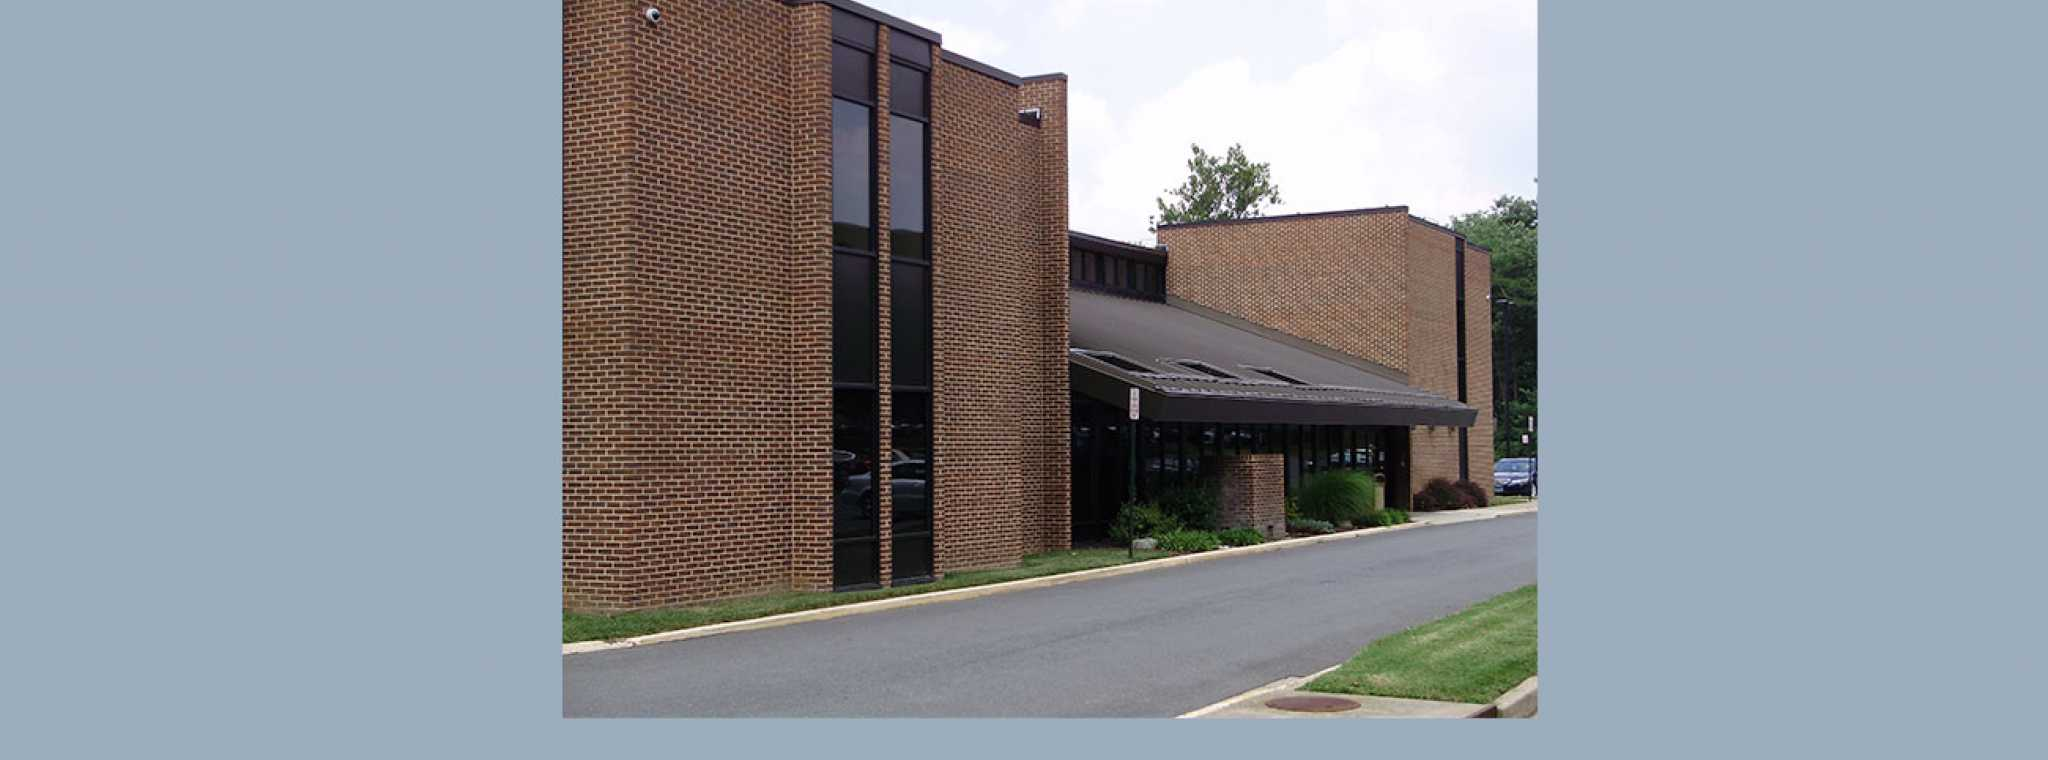 Kaiser Permanente Regional Headquarters Amp Laboratory Sk